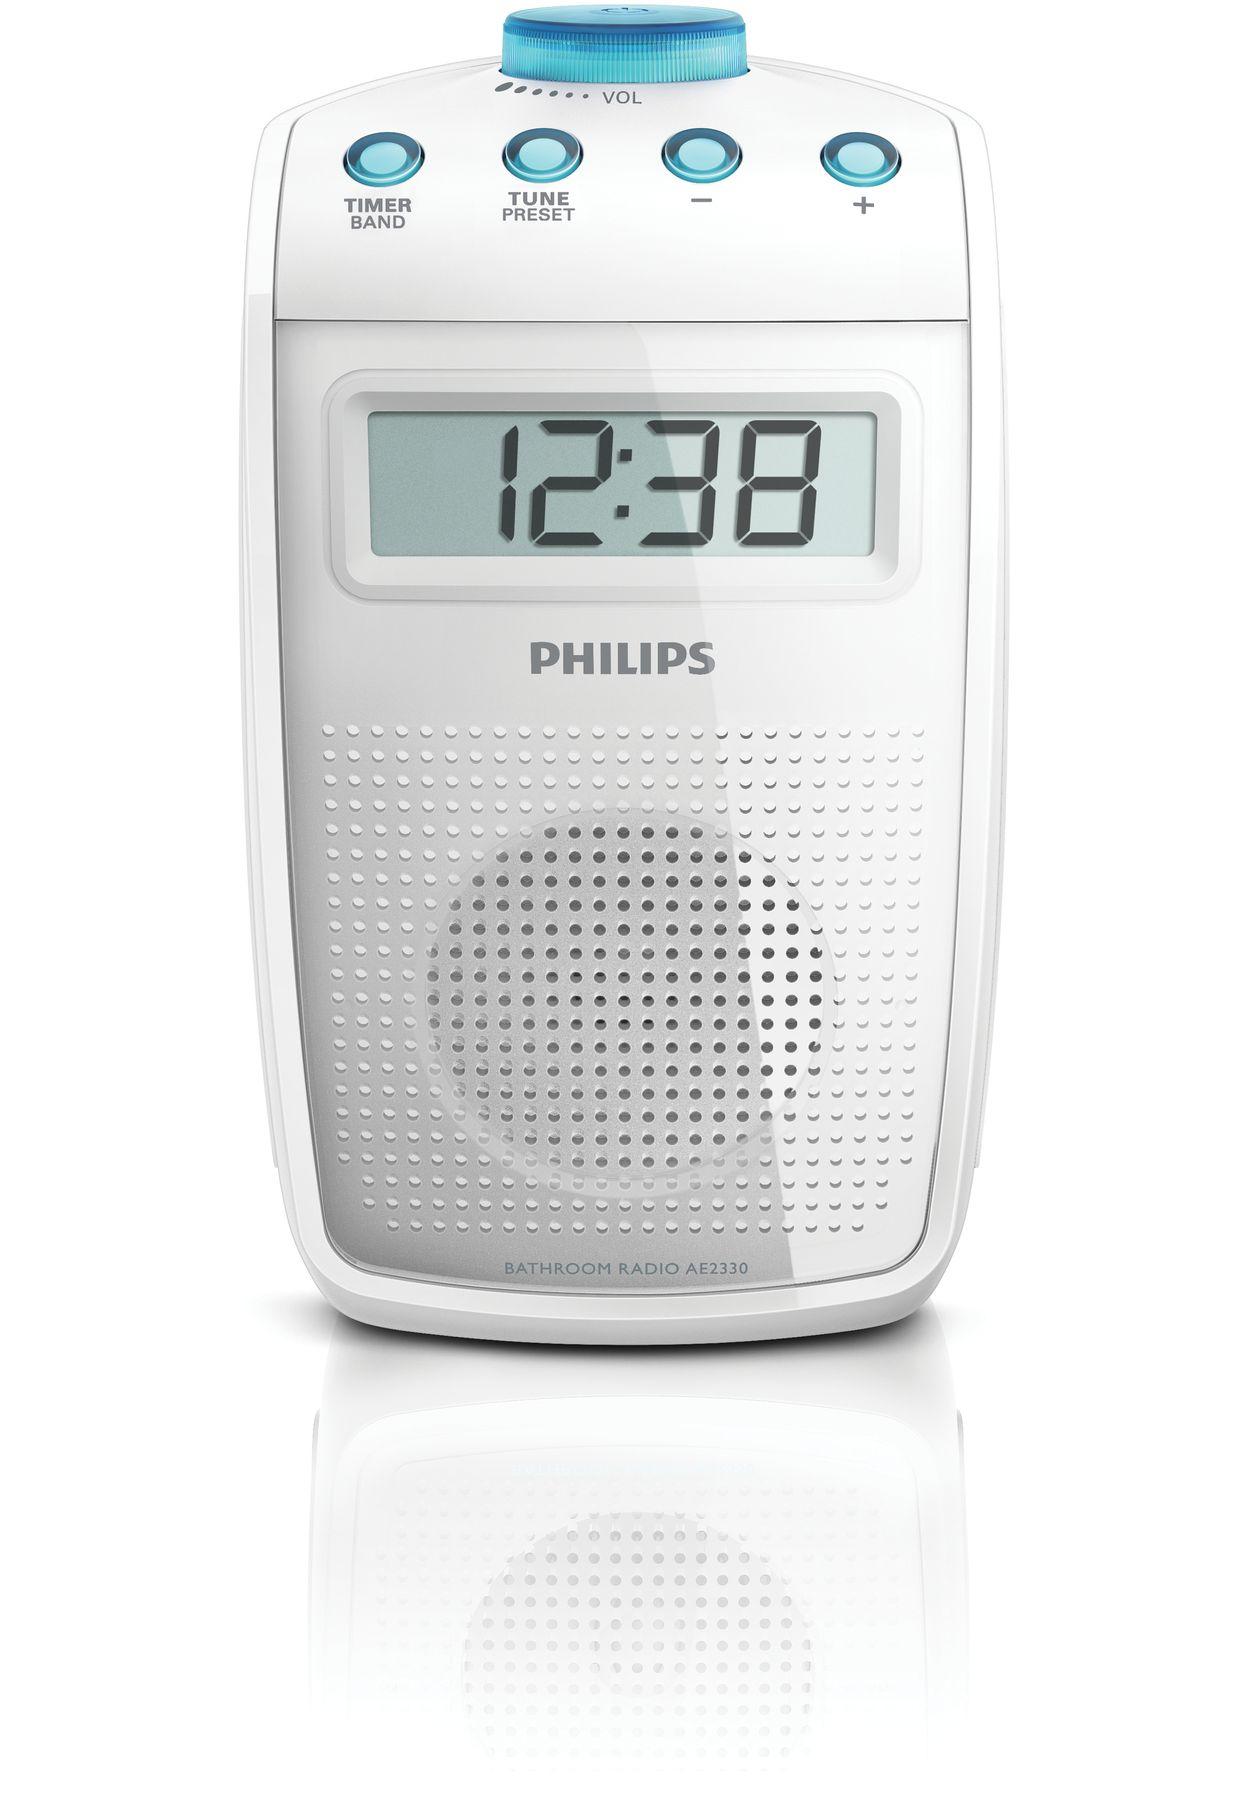 Radio de salle de bains AE233000  Philips